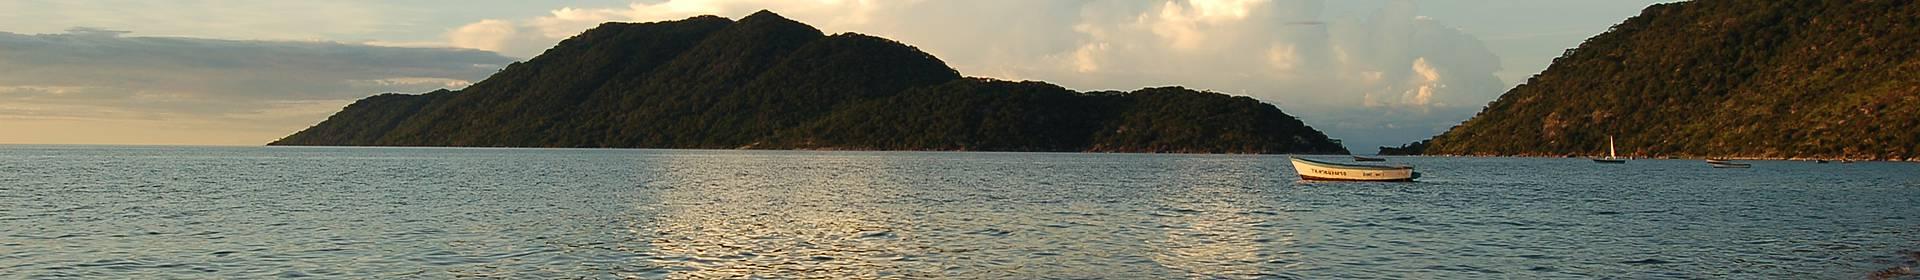 Cape Maclear